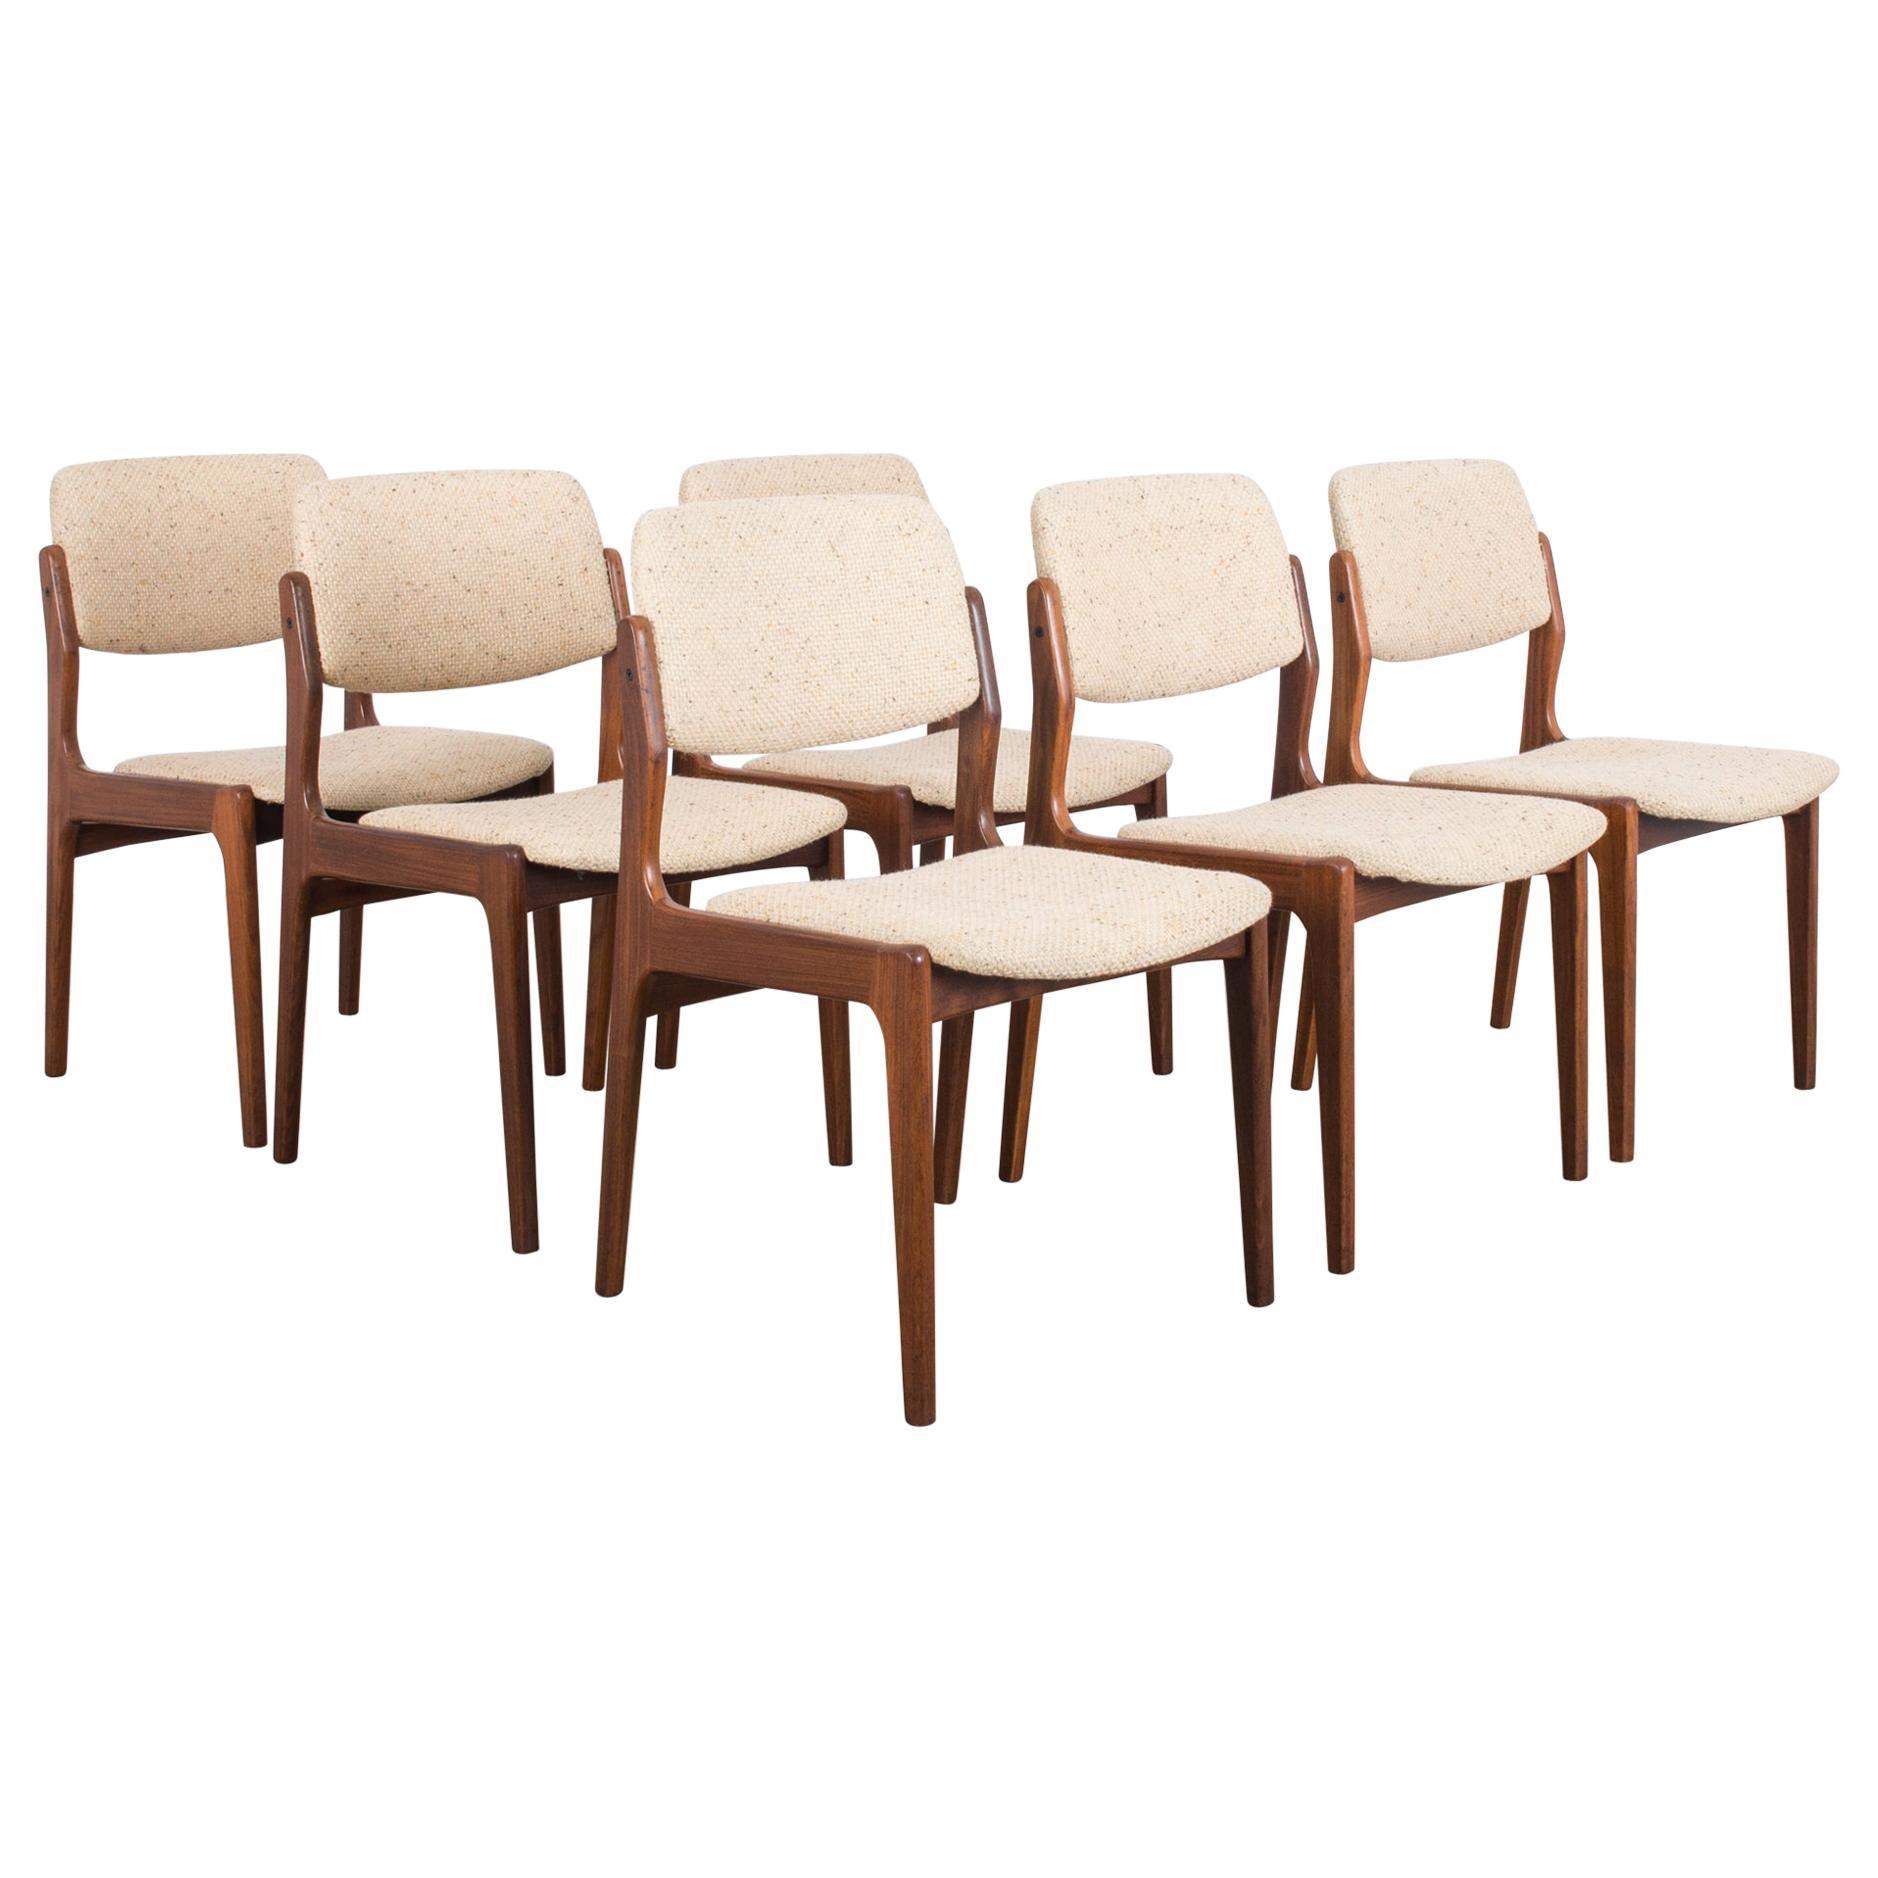 1960s Danish Wooden Chairs, Set of Six